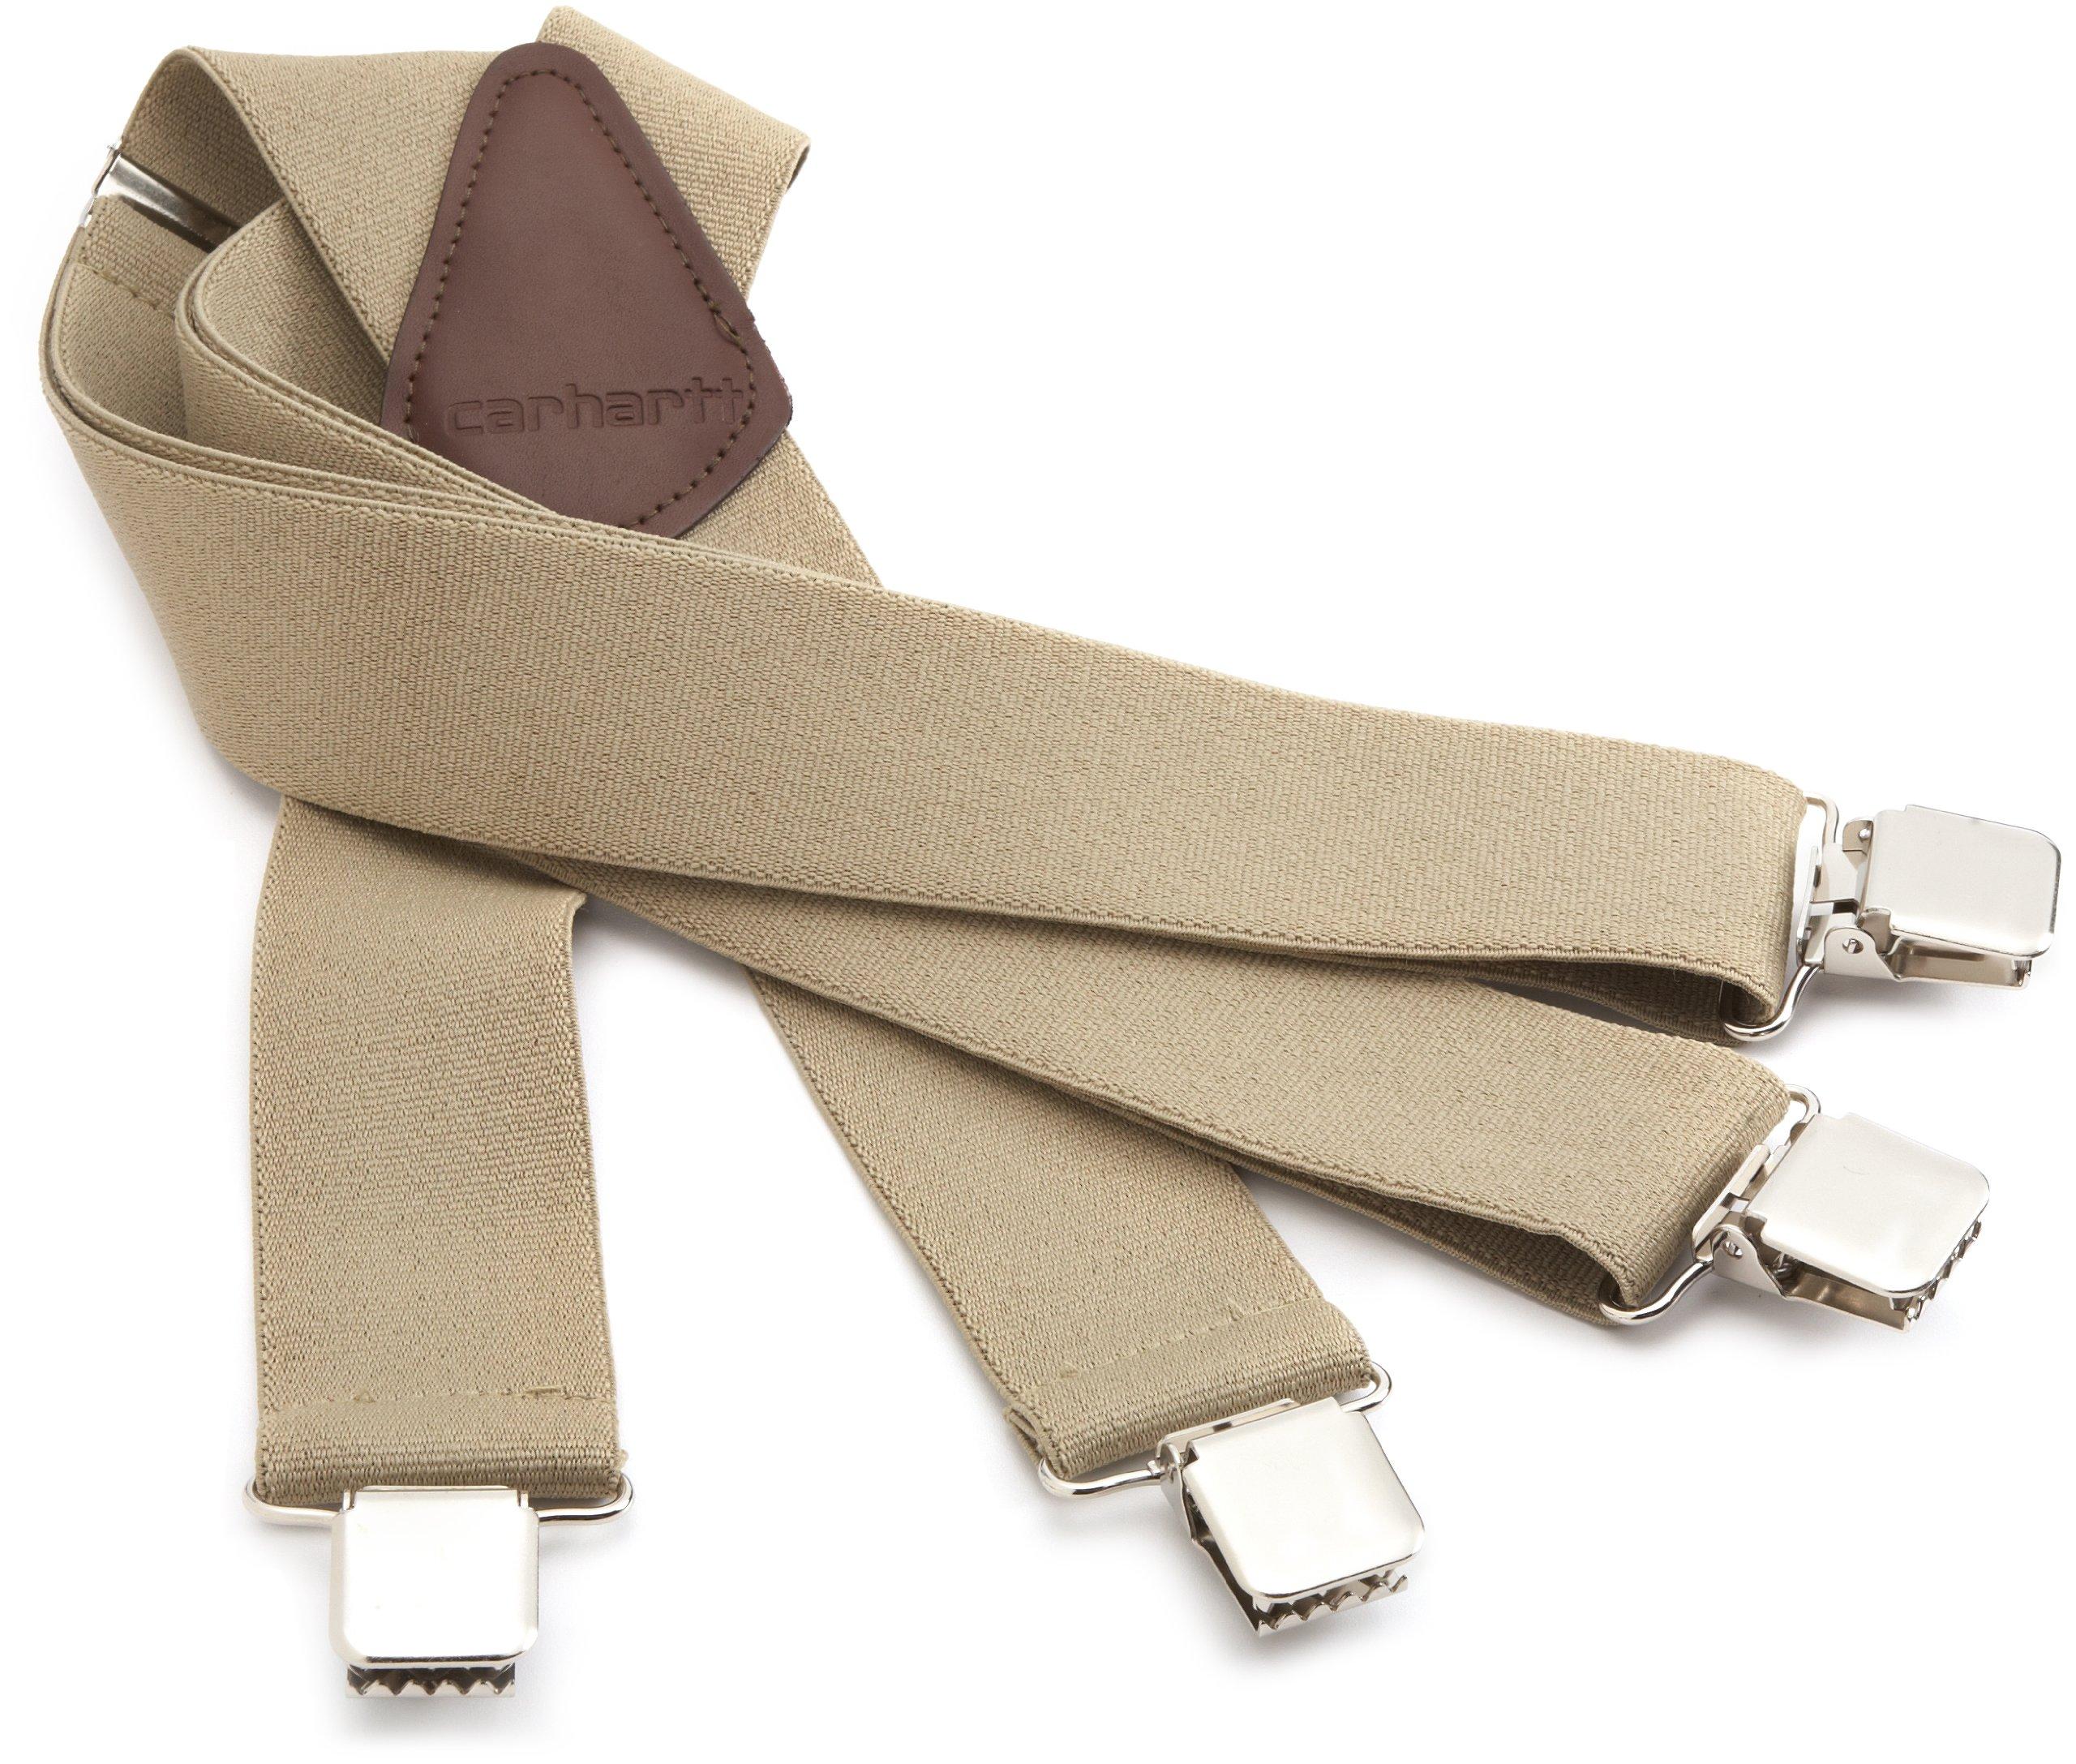 Carhartt Men's Utility Suspender,Khaki,One Size